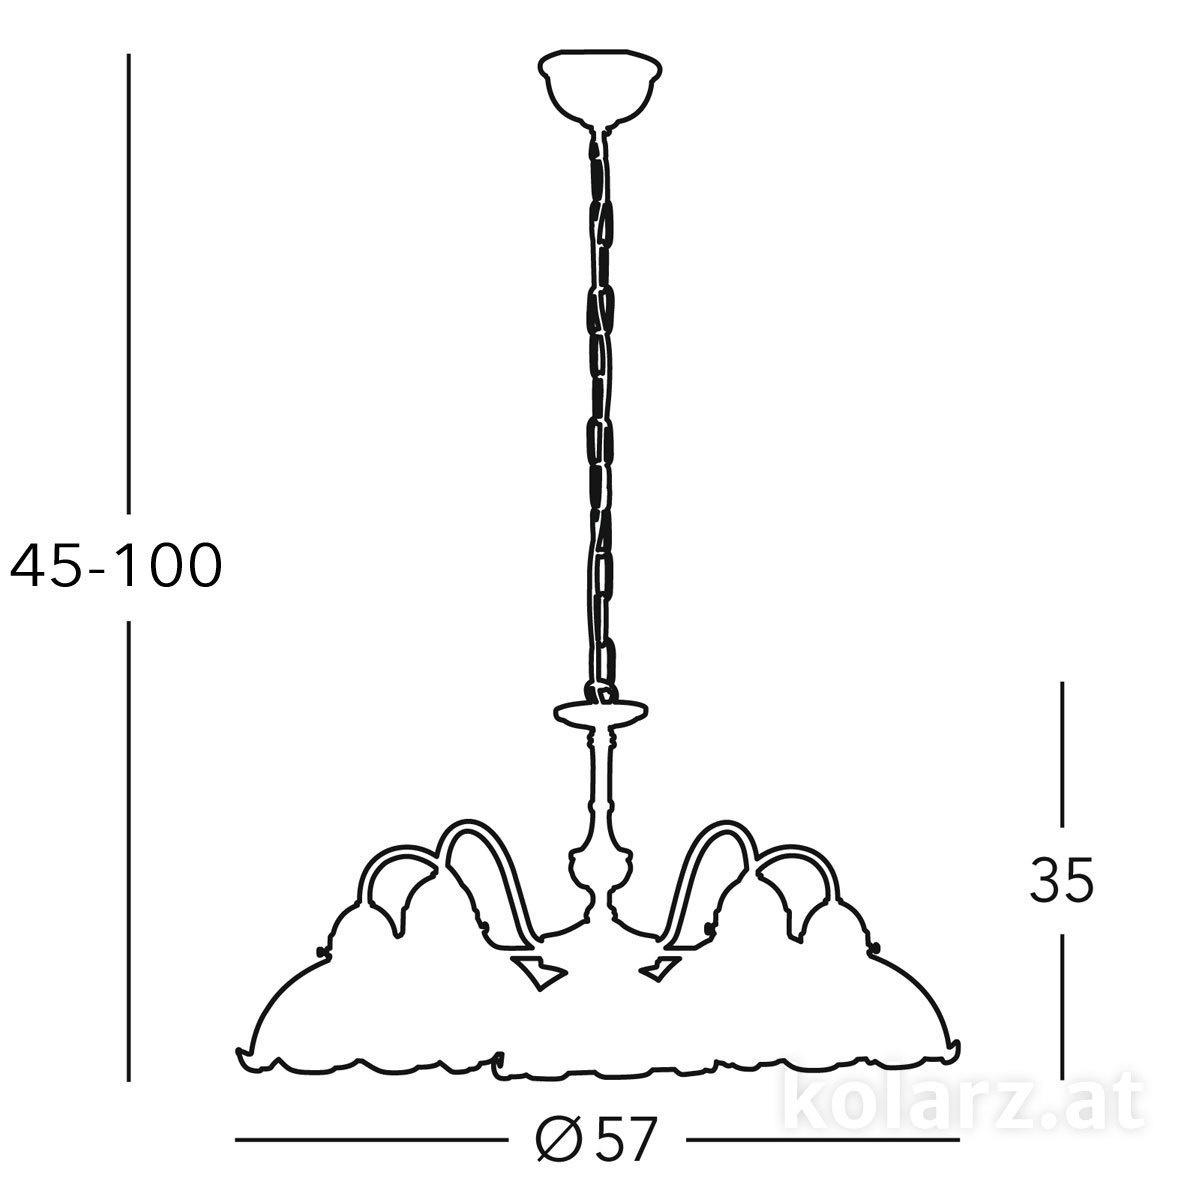 731-85-70-s1.jpg